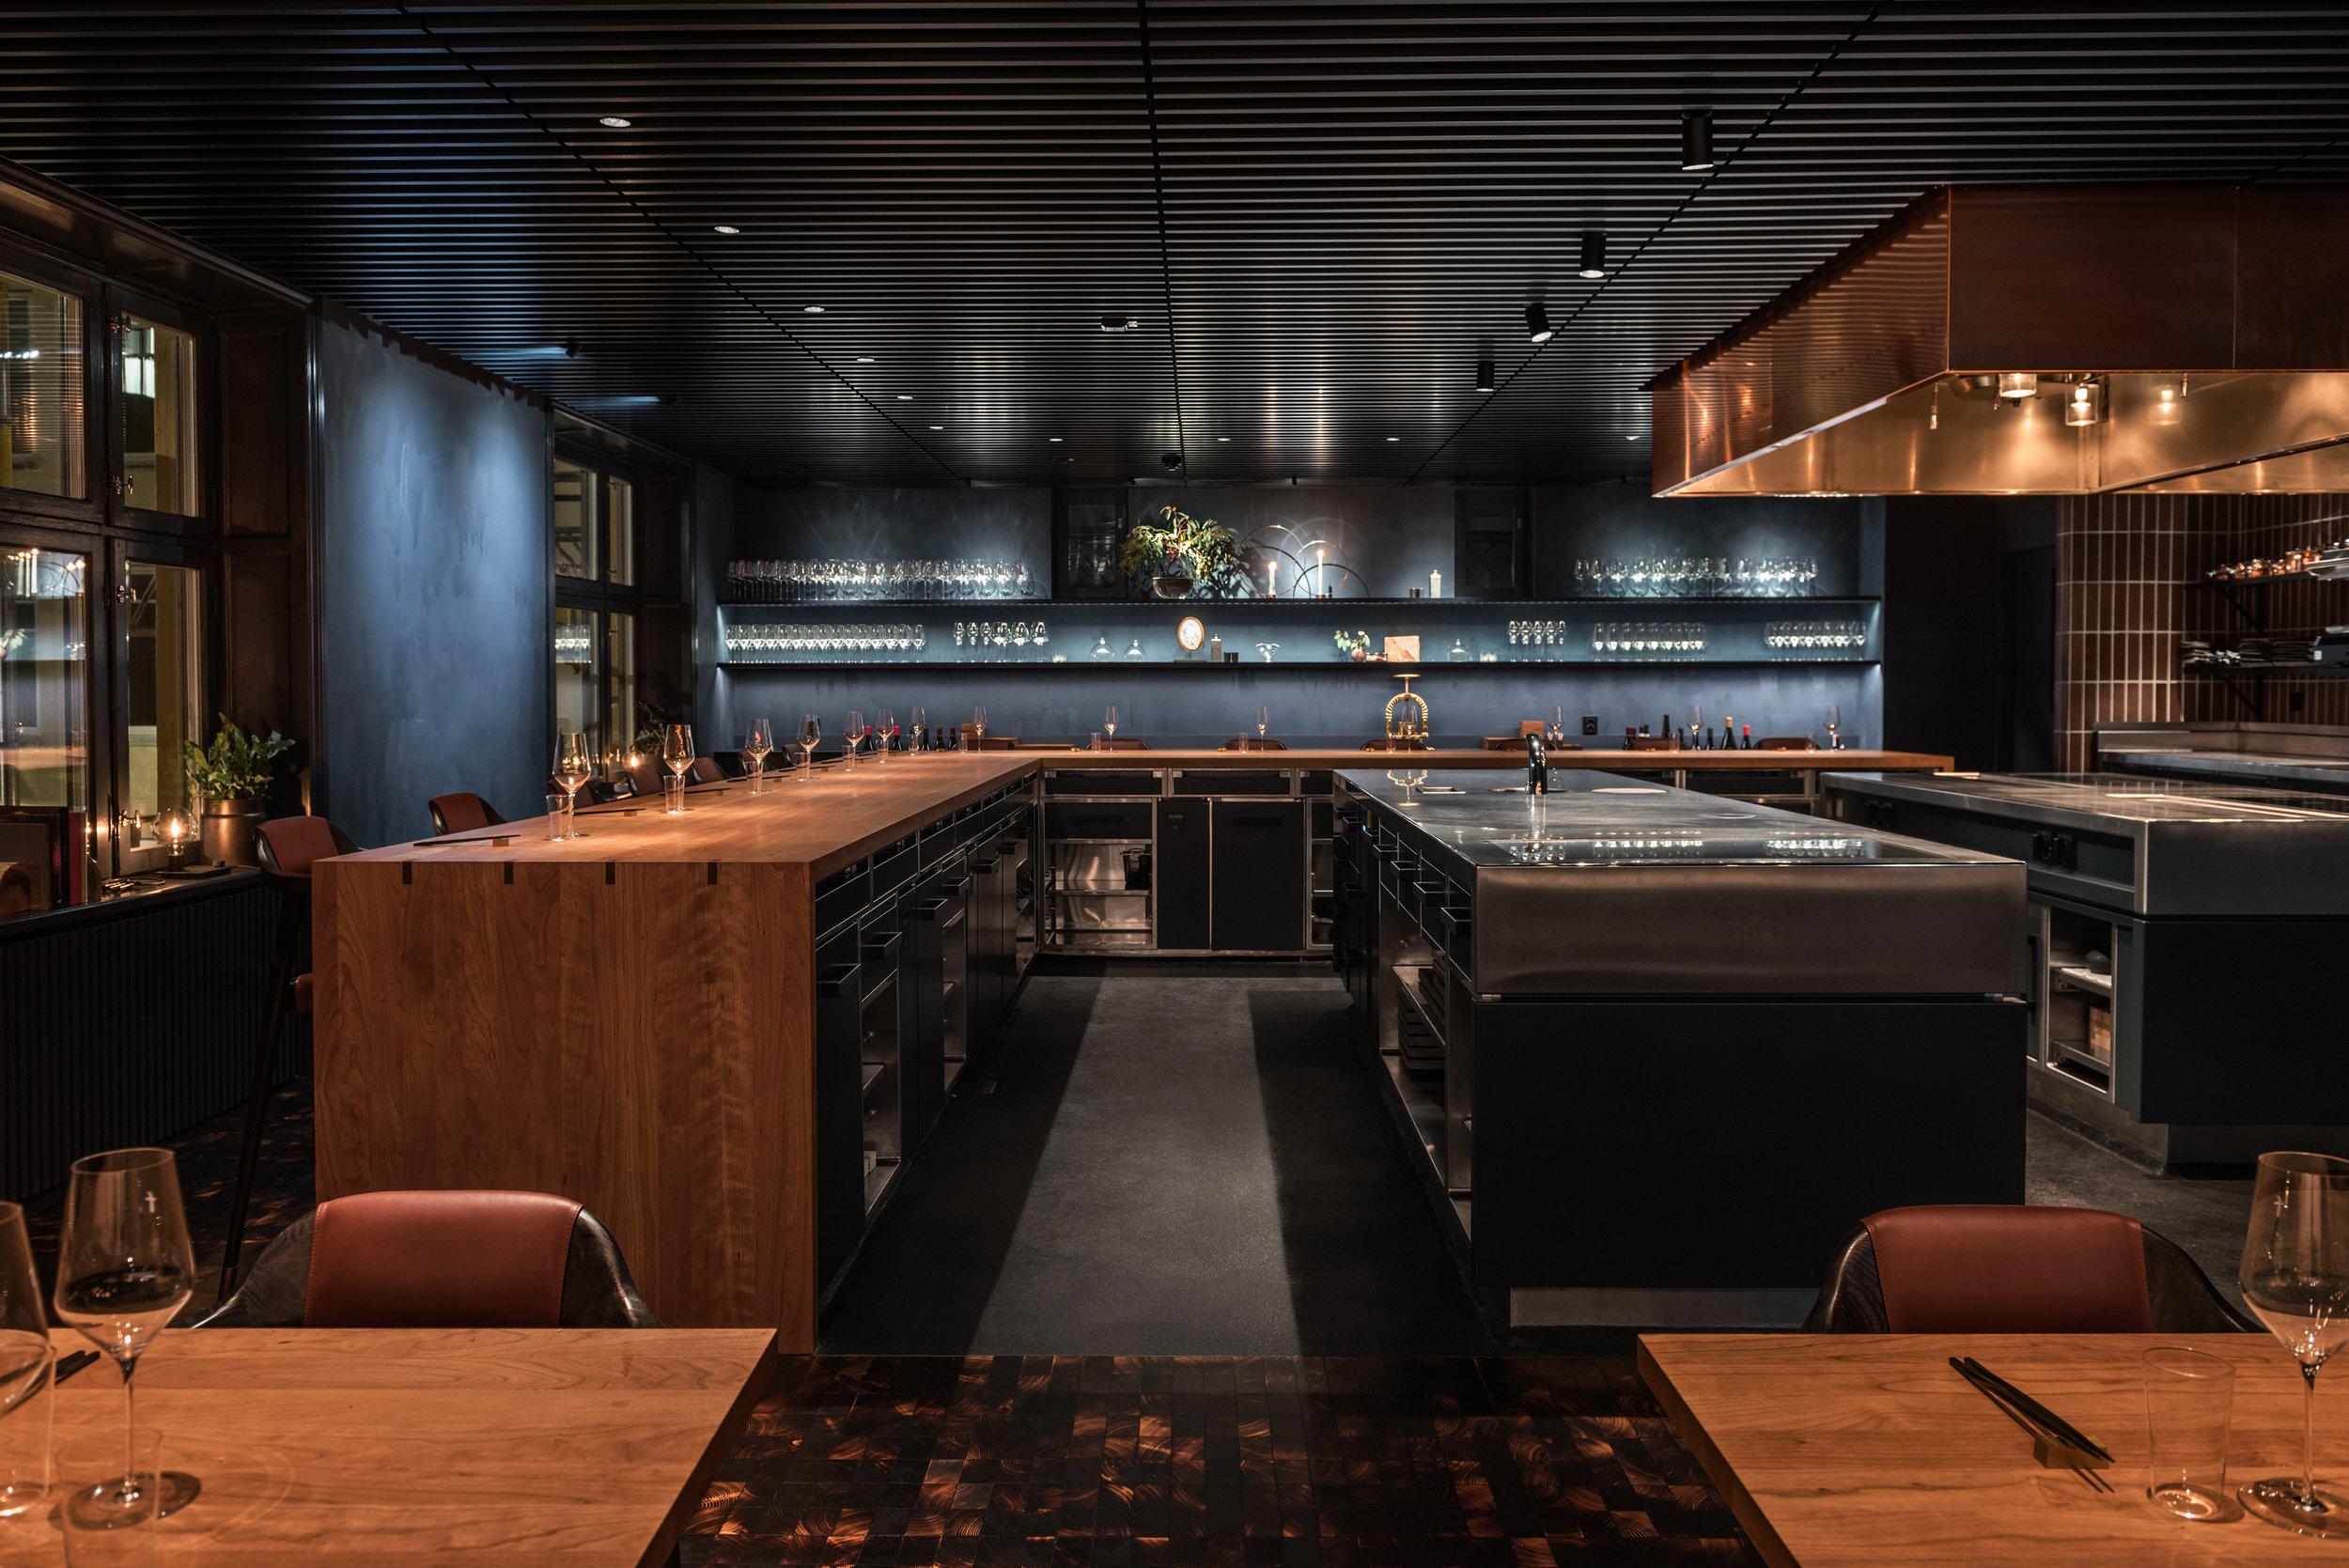 Frantzéns restaurang, ljussatt av Sofie Bamberg och Anna Ekberg / Foto: Erik Lefvander